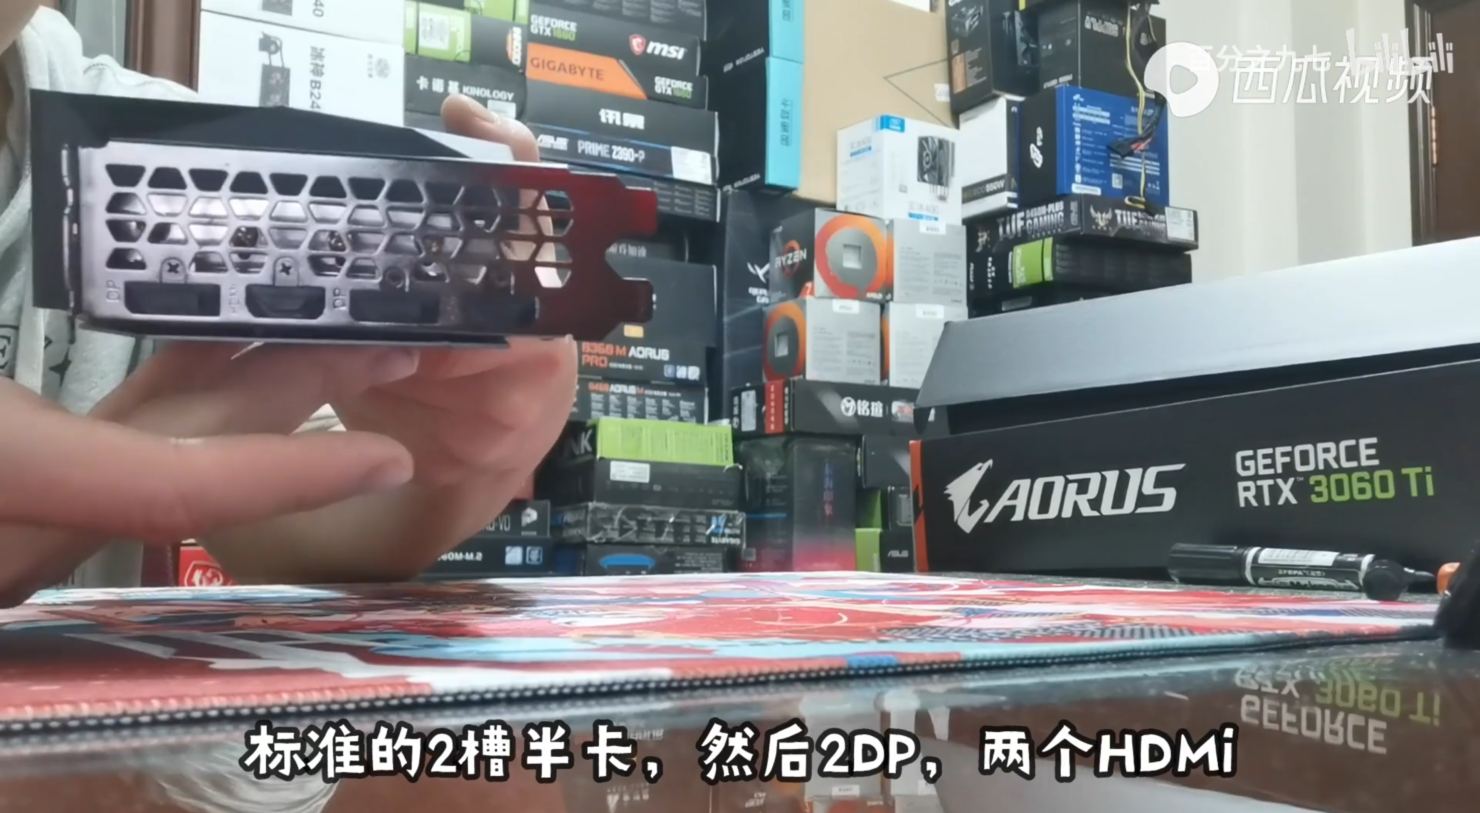 gigabyte-geforce-rtx-3060-ti-gaming-oc-pro-graphics-card_6